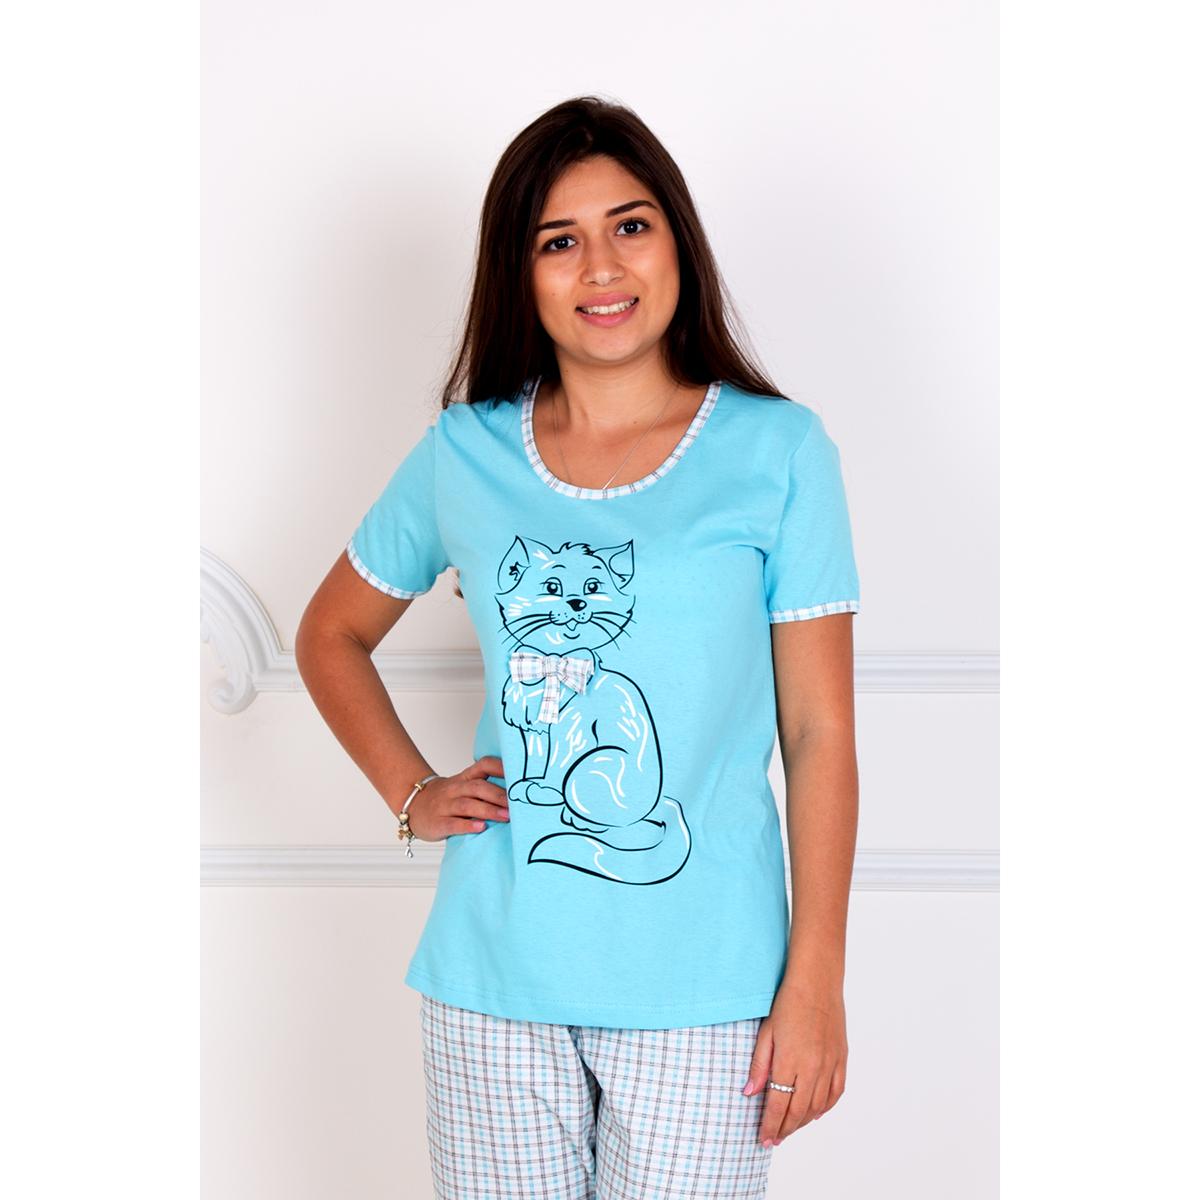 Женский пижама Киска Бирюзовый, размер 48Пижамы и ночные сорочки<br>Обхват груди:96 см<br>Обхват талии:78 см<br>Обхват бедер:104 см<br>Рост:167 см<br><br>Тип: Жен. костюм<br>Размер: 48<br>Материал: Кулирка